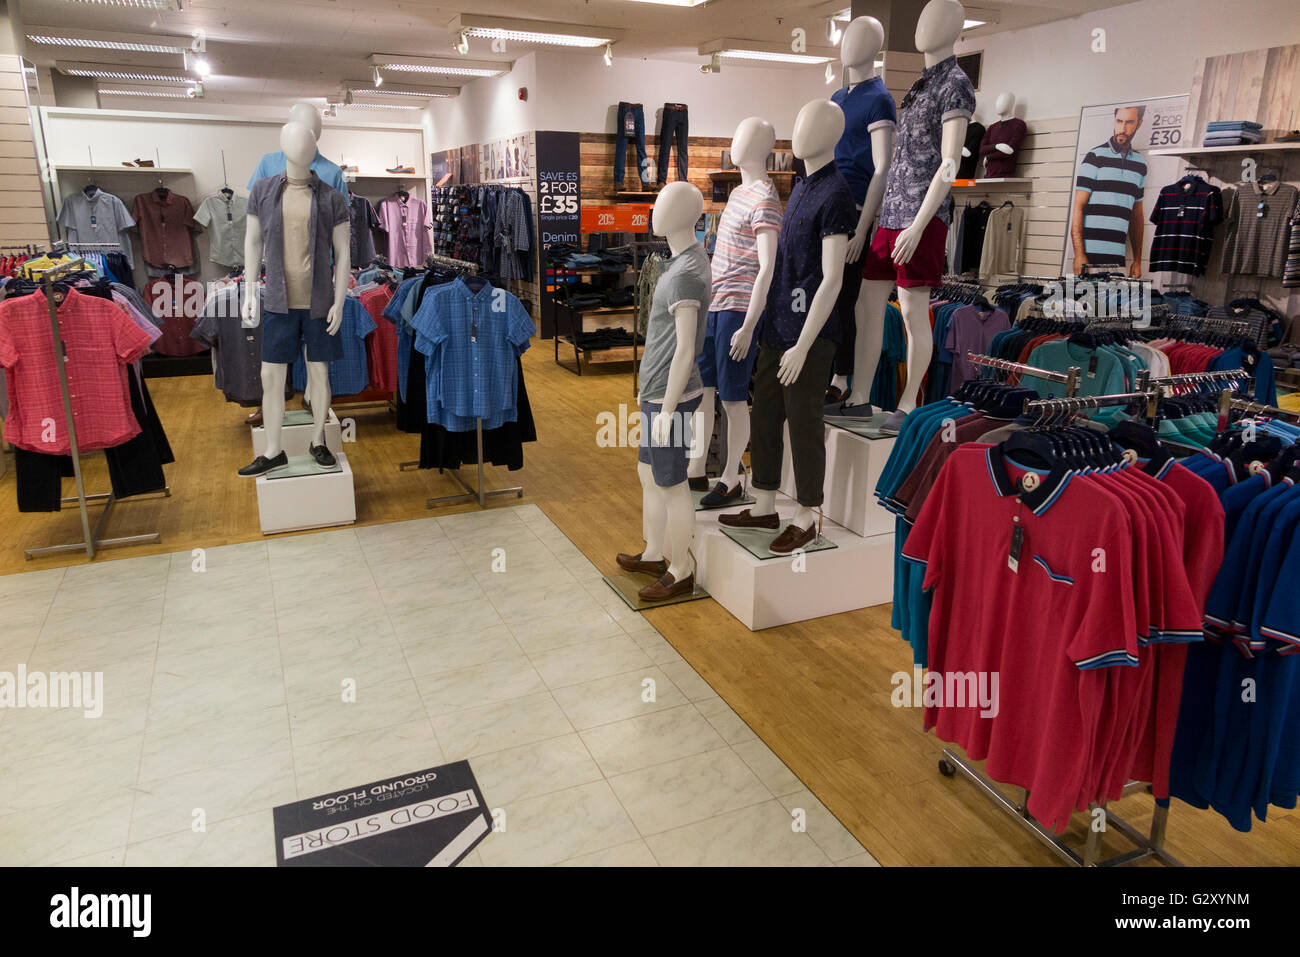 British clothing store online